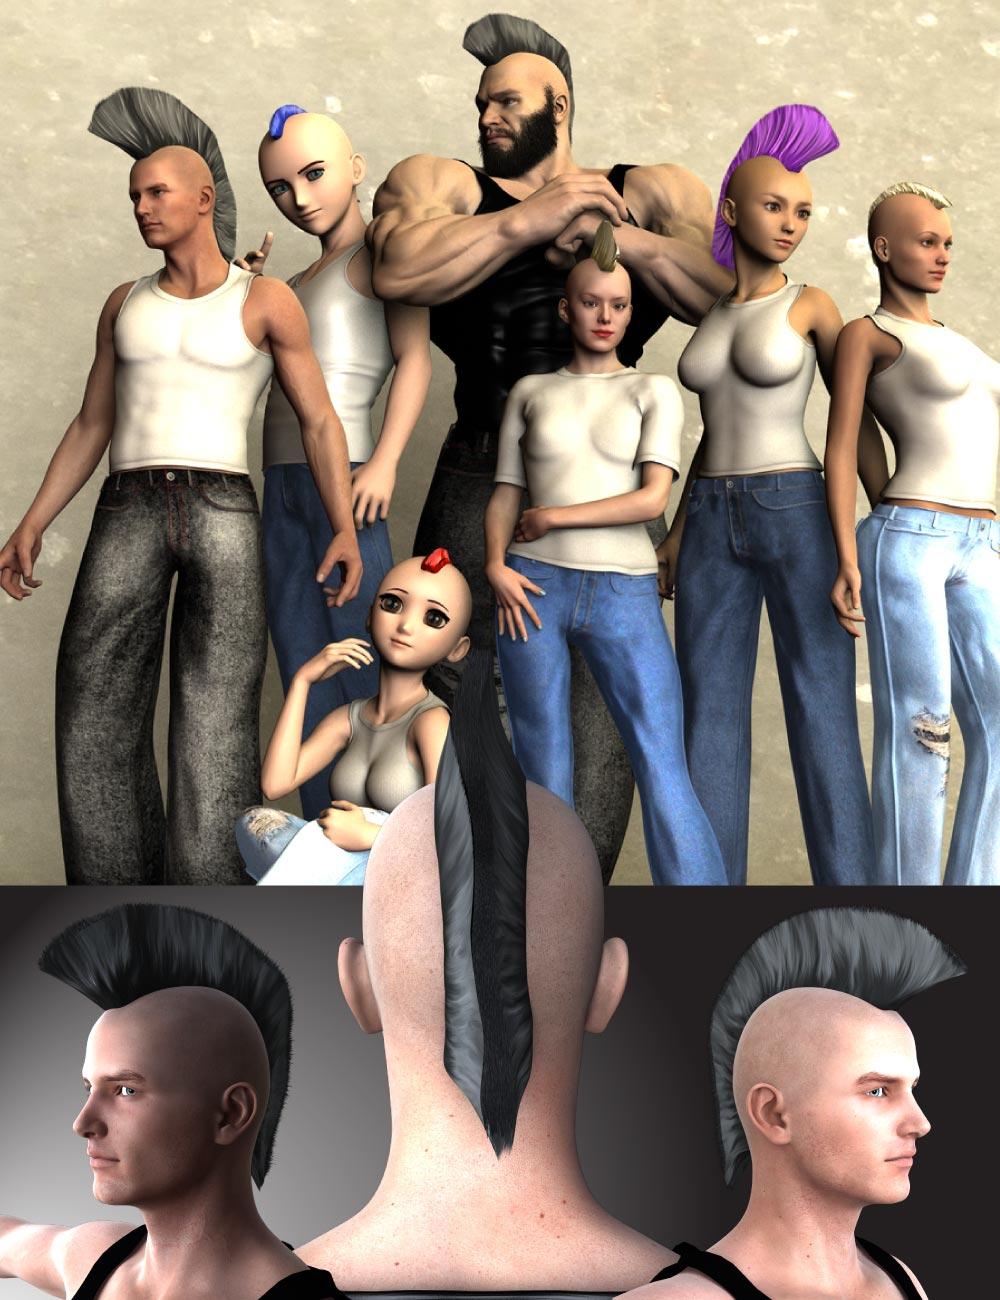 DA Mohawk Genesis by: Design Anvil, 3D Models by Daz 3D